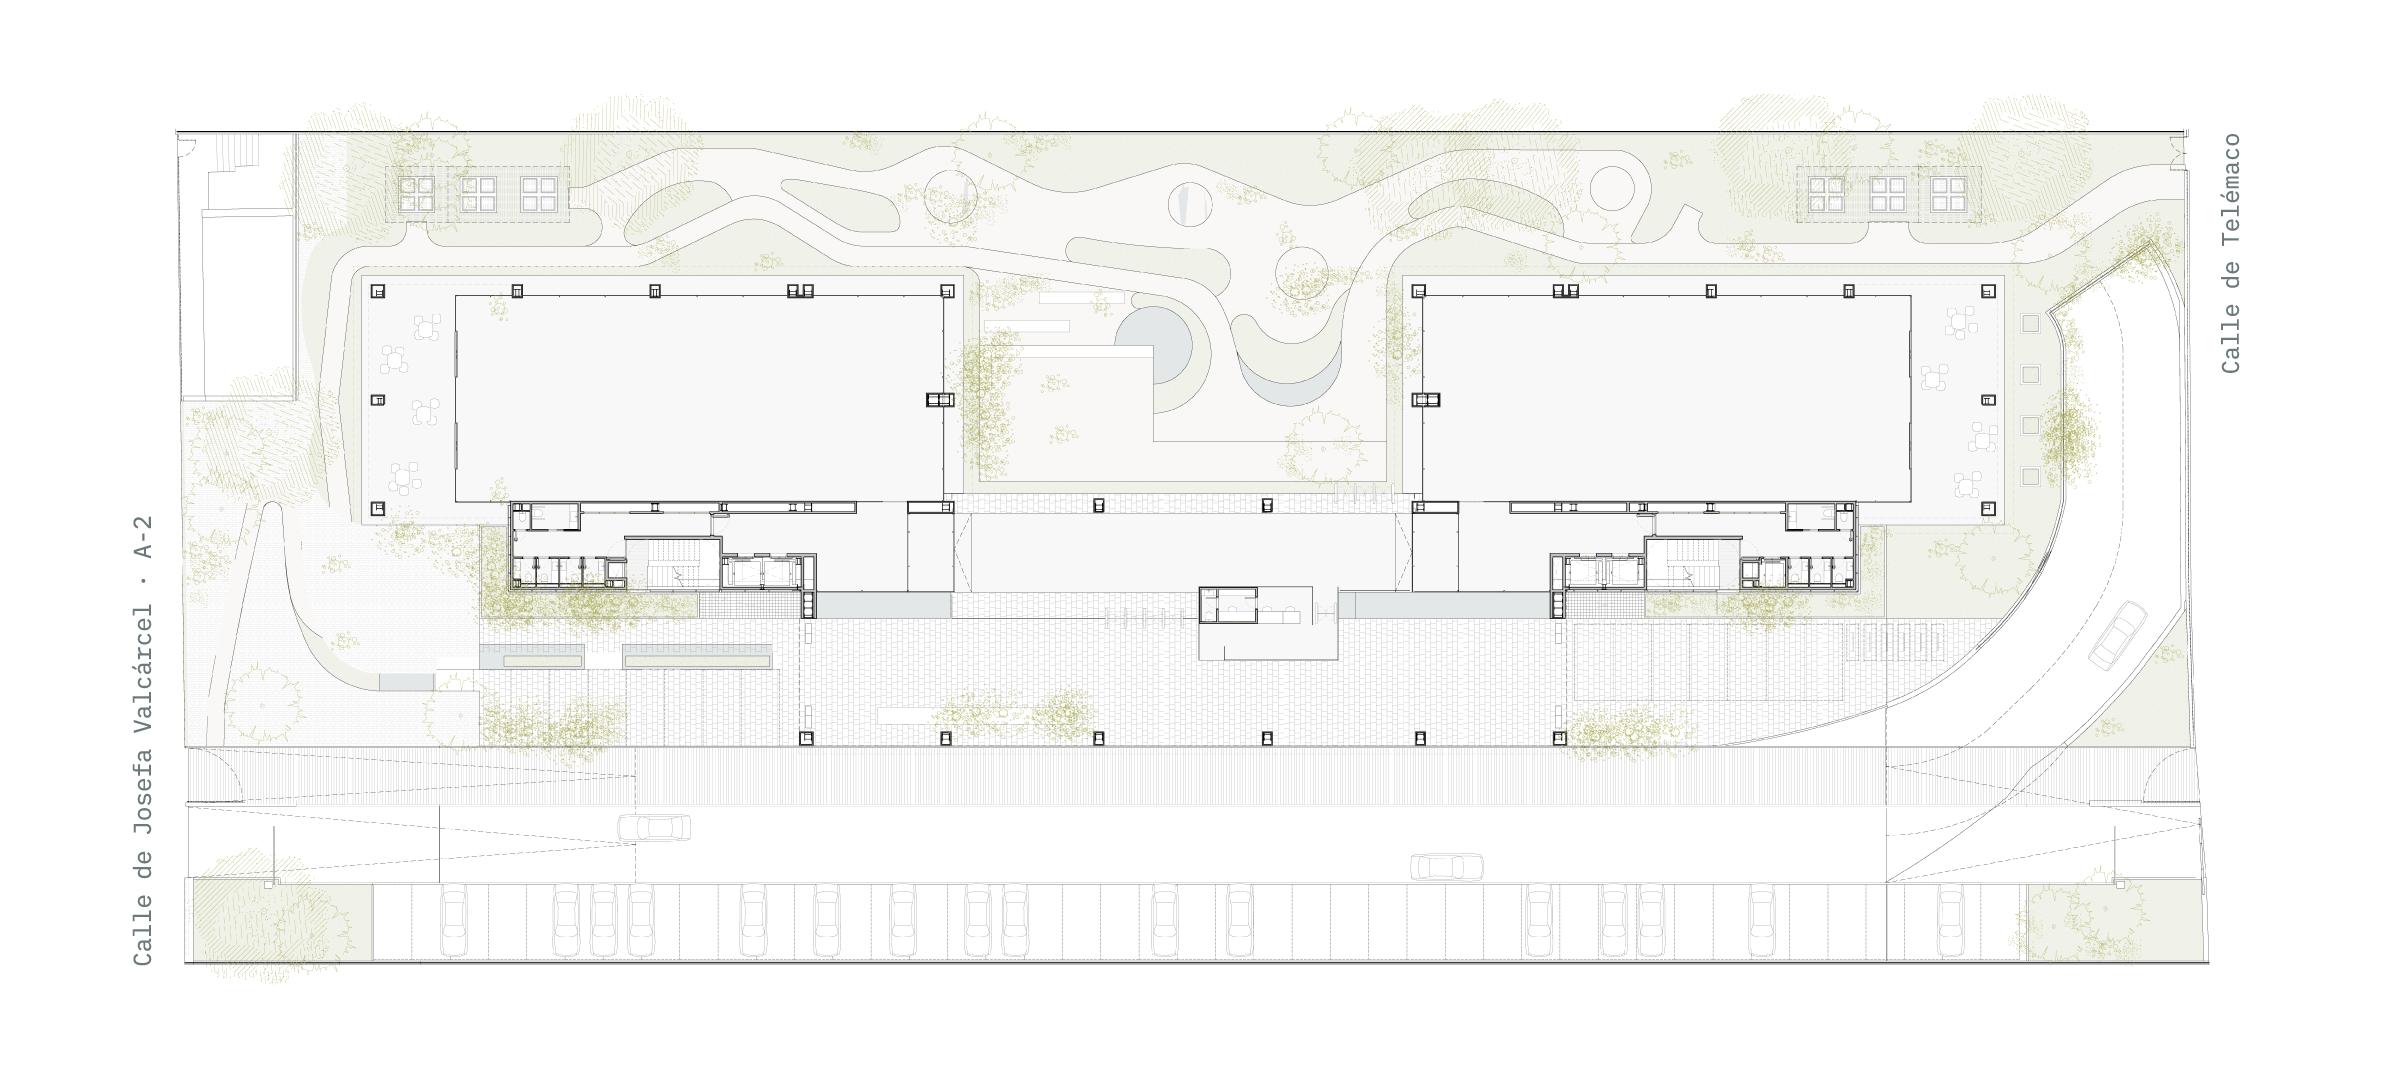 Plano 00 arquitectura